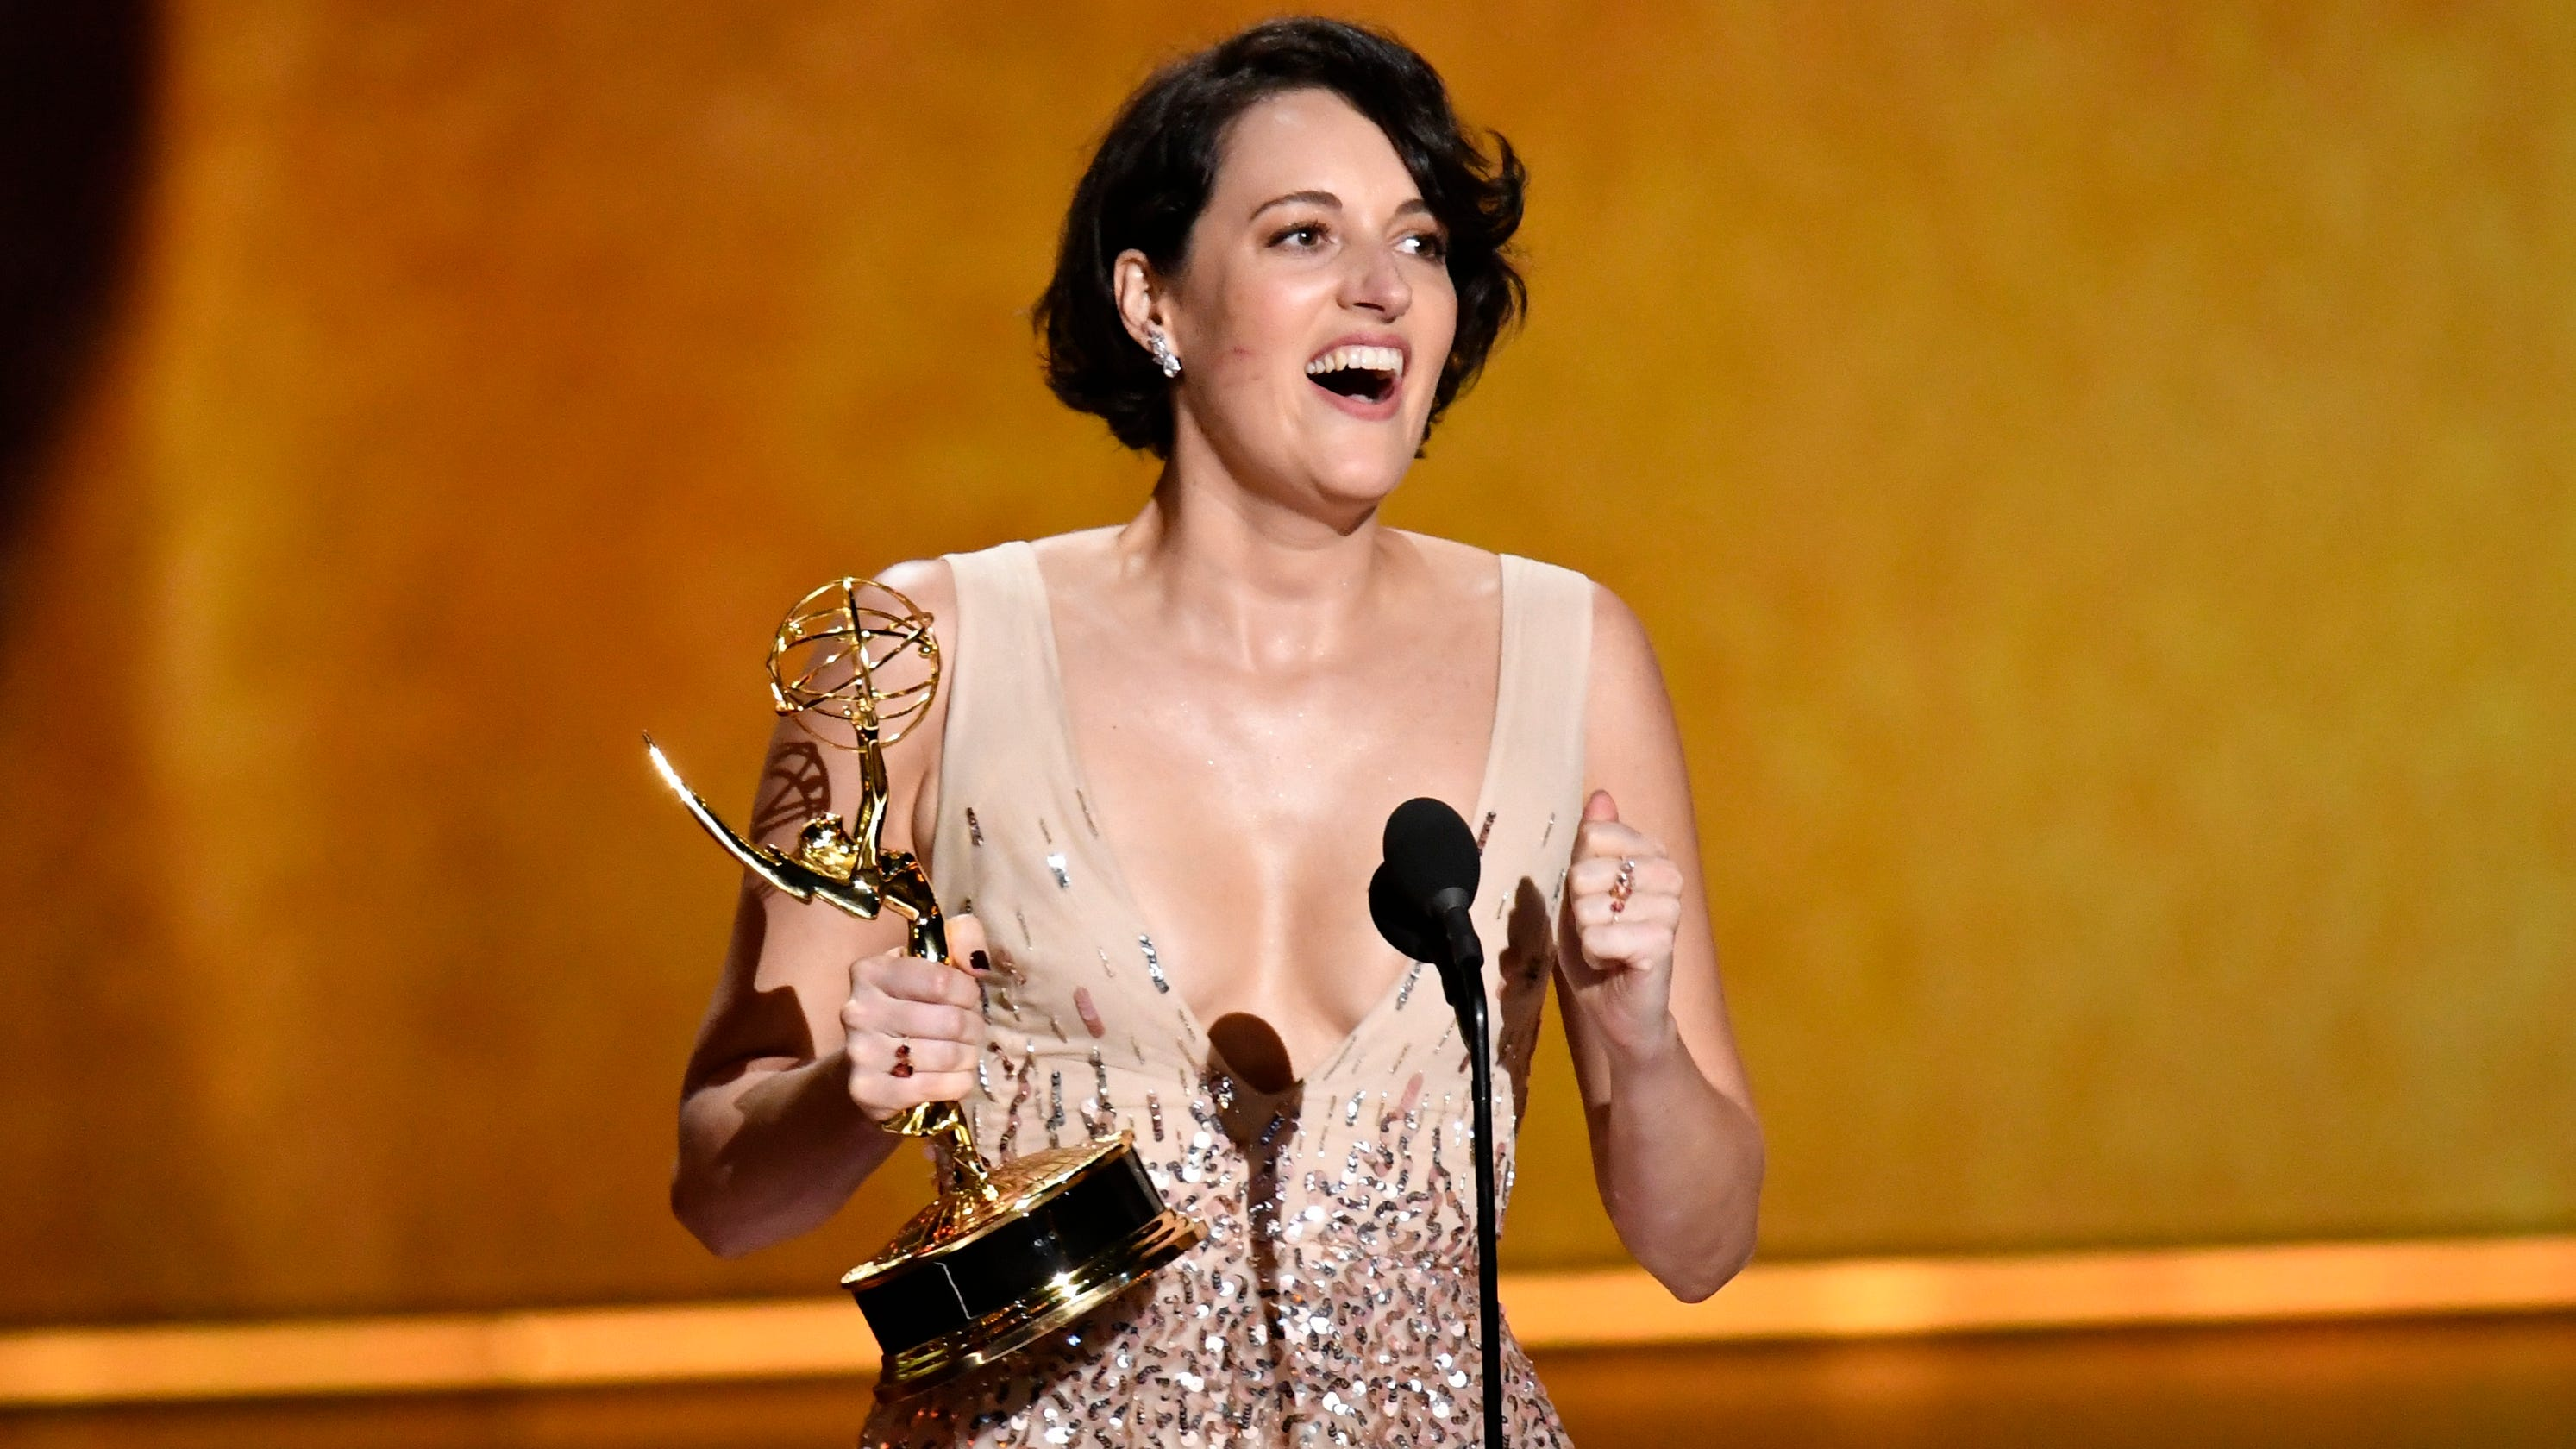 Emmys 2019: Phoebe Waller-Bridge, Bill Hader take top comedy acting honors